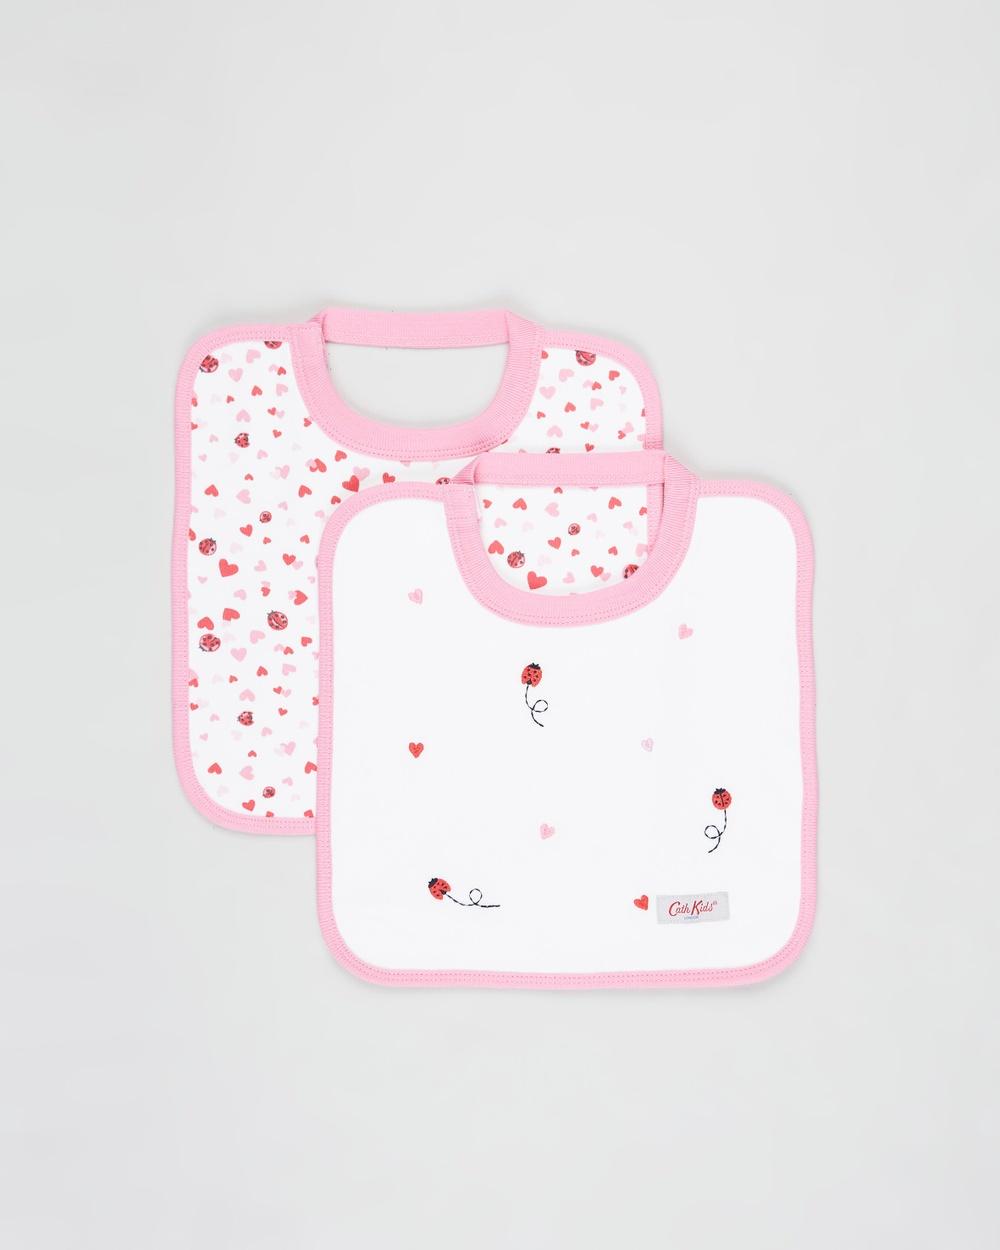 Cath Kidston Square Bibs 2 Pack Babies Mini Lovebugs 2-Pack